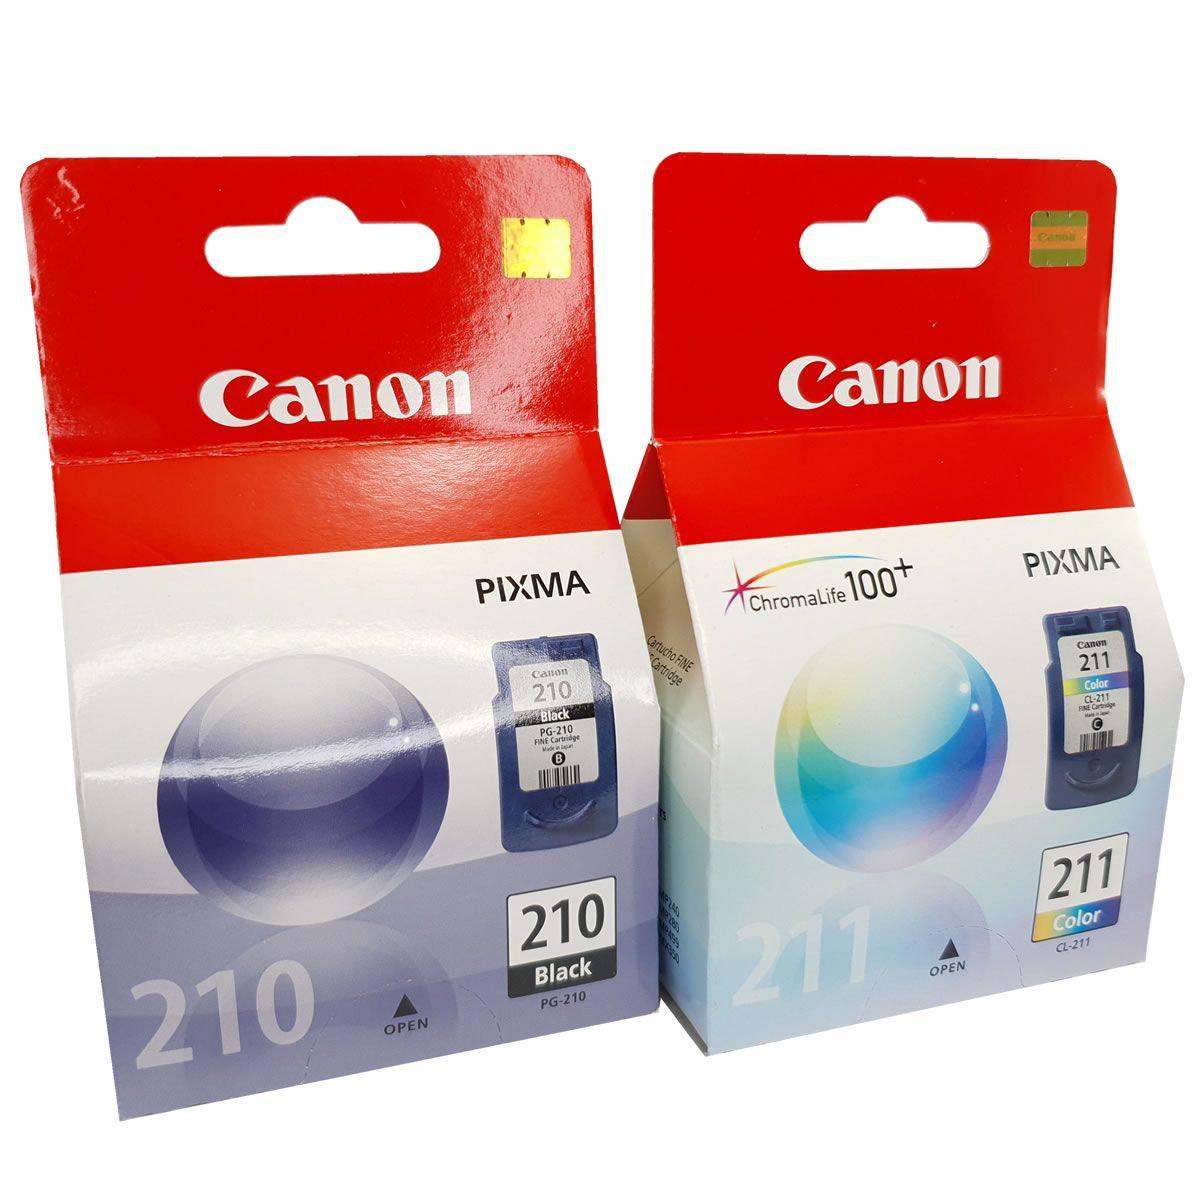 2 cartuchos Canon PG210 preto e CL211 colorido para MP240 MP250 MP260 MP490